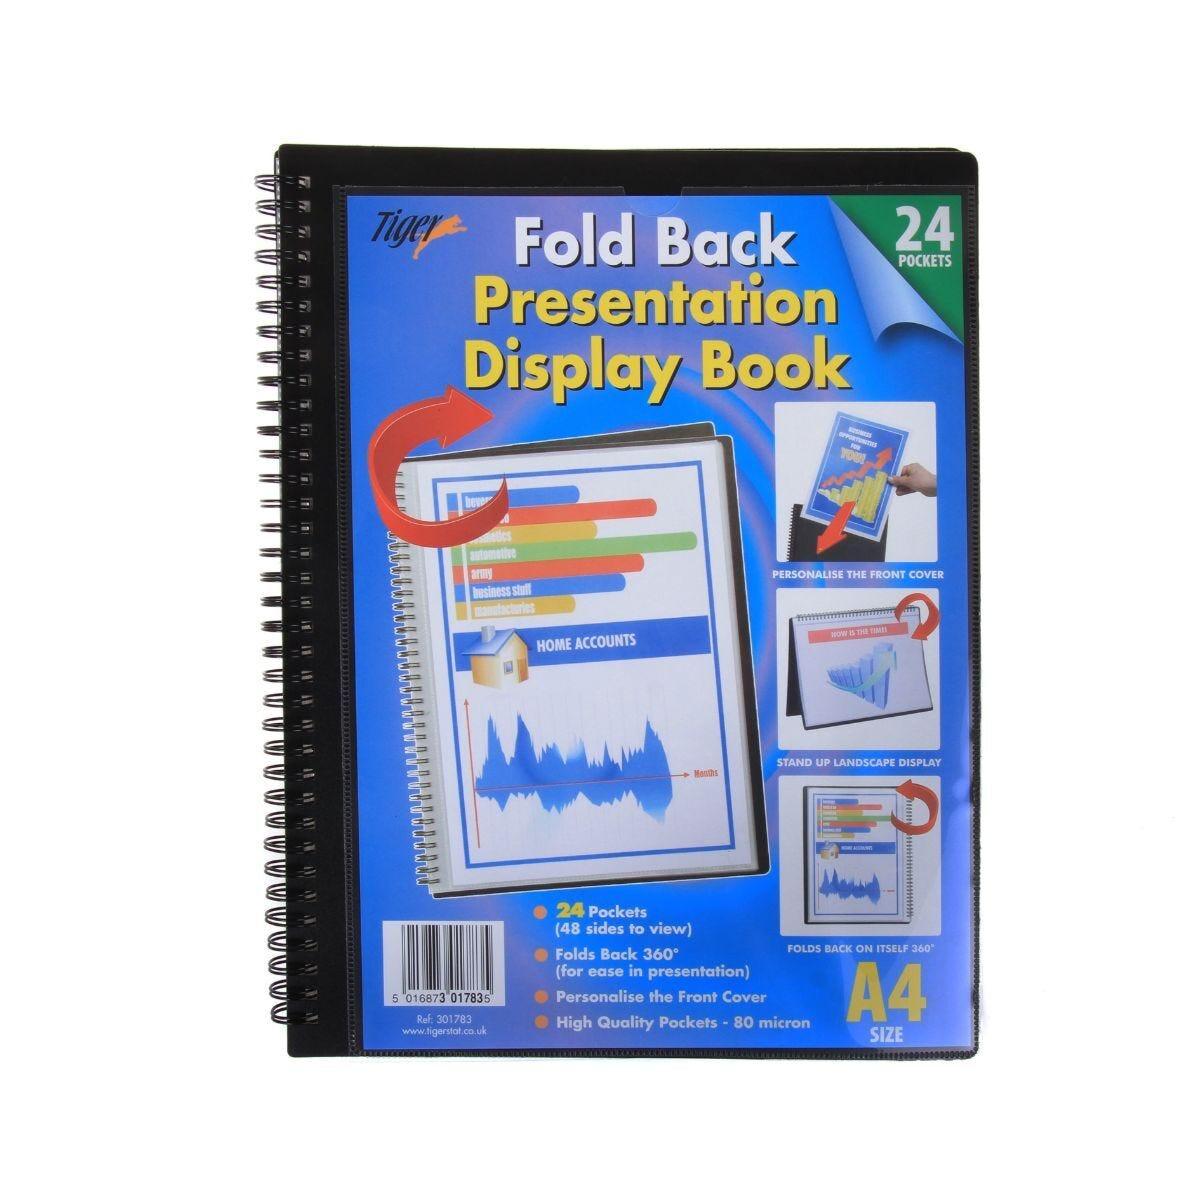 Tiger Presentation Display Book 24 Pocket